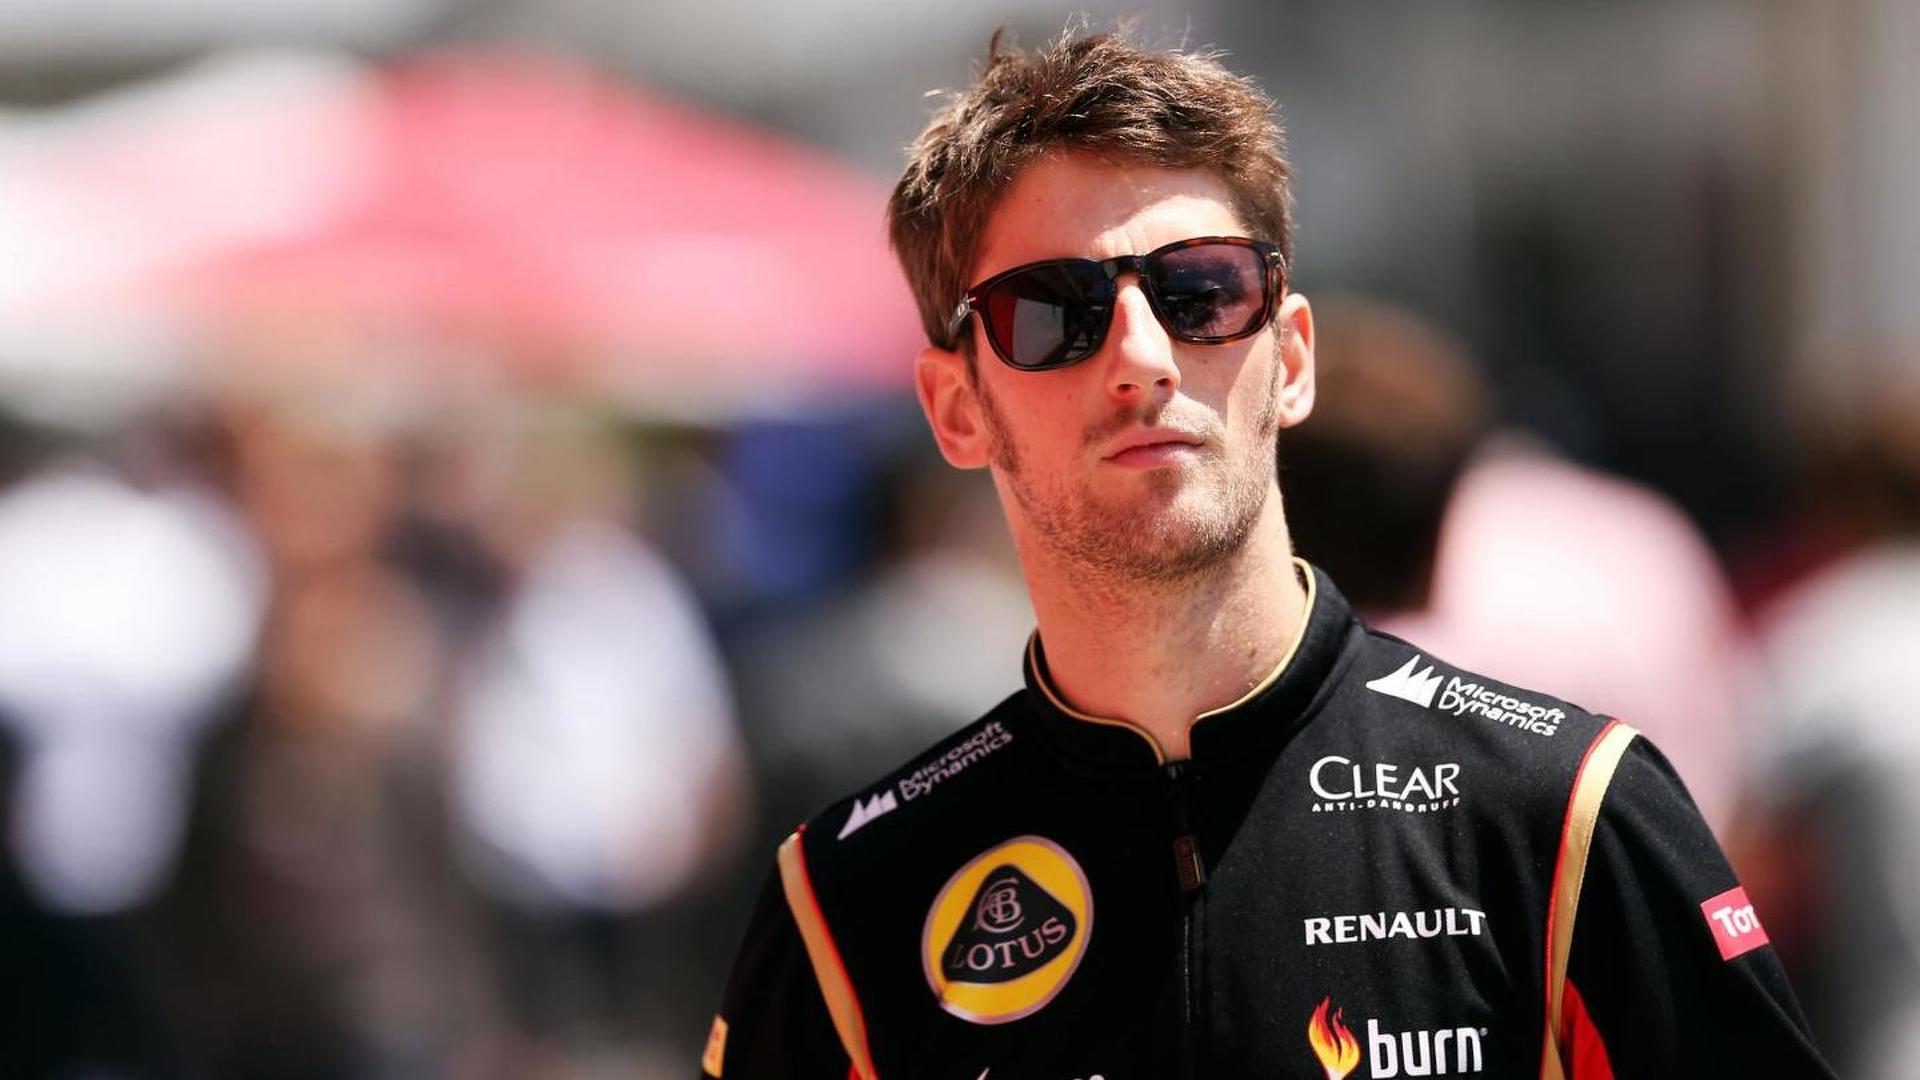 Grosjean jumps the gun on new Lotus deal